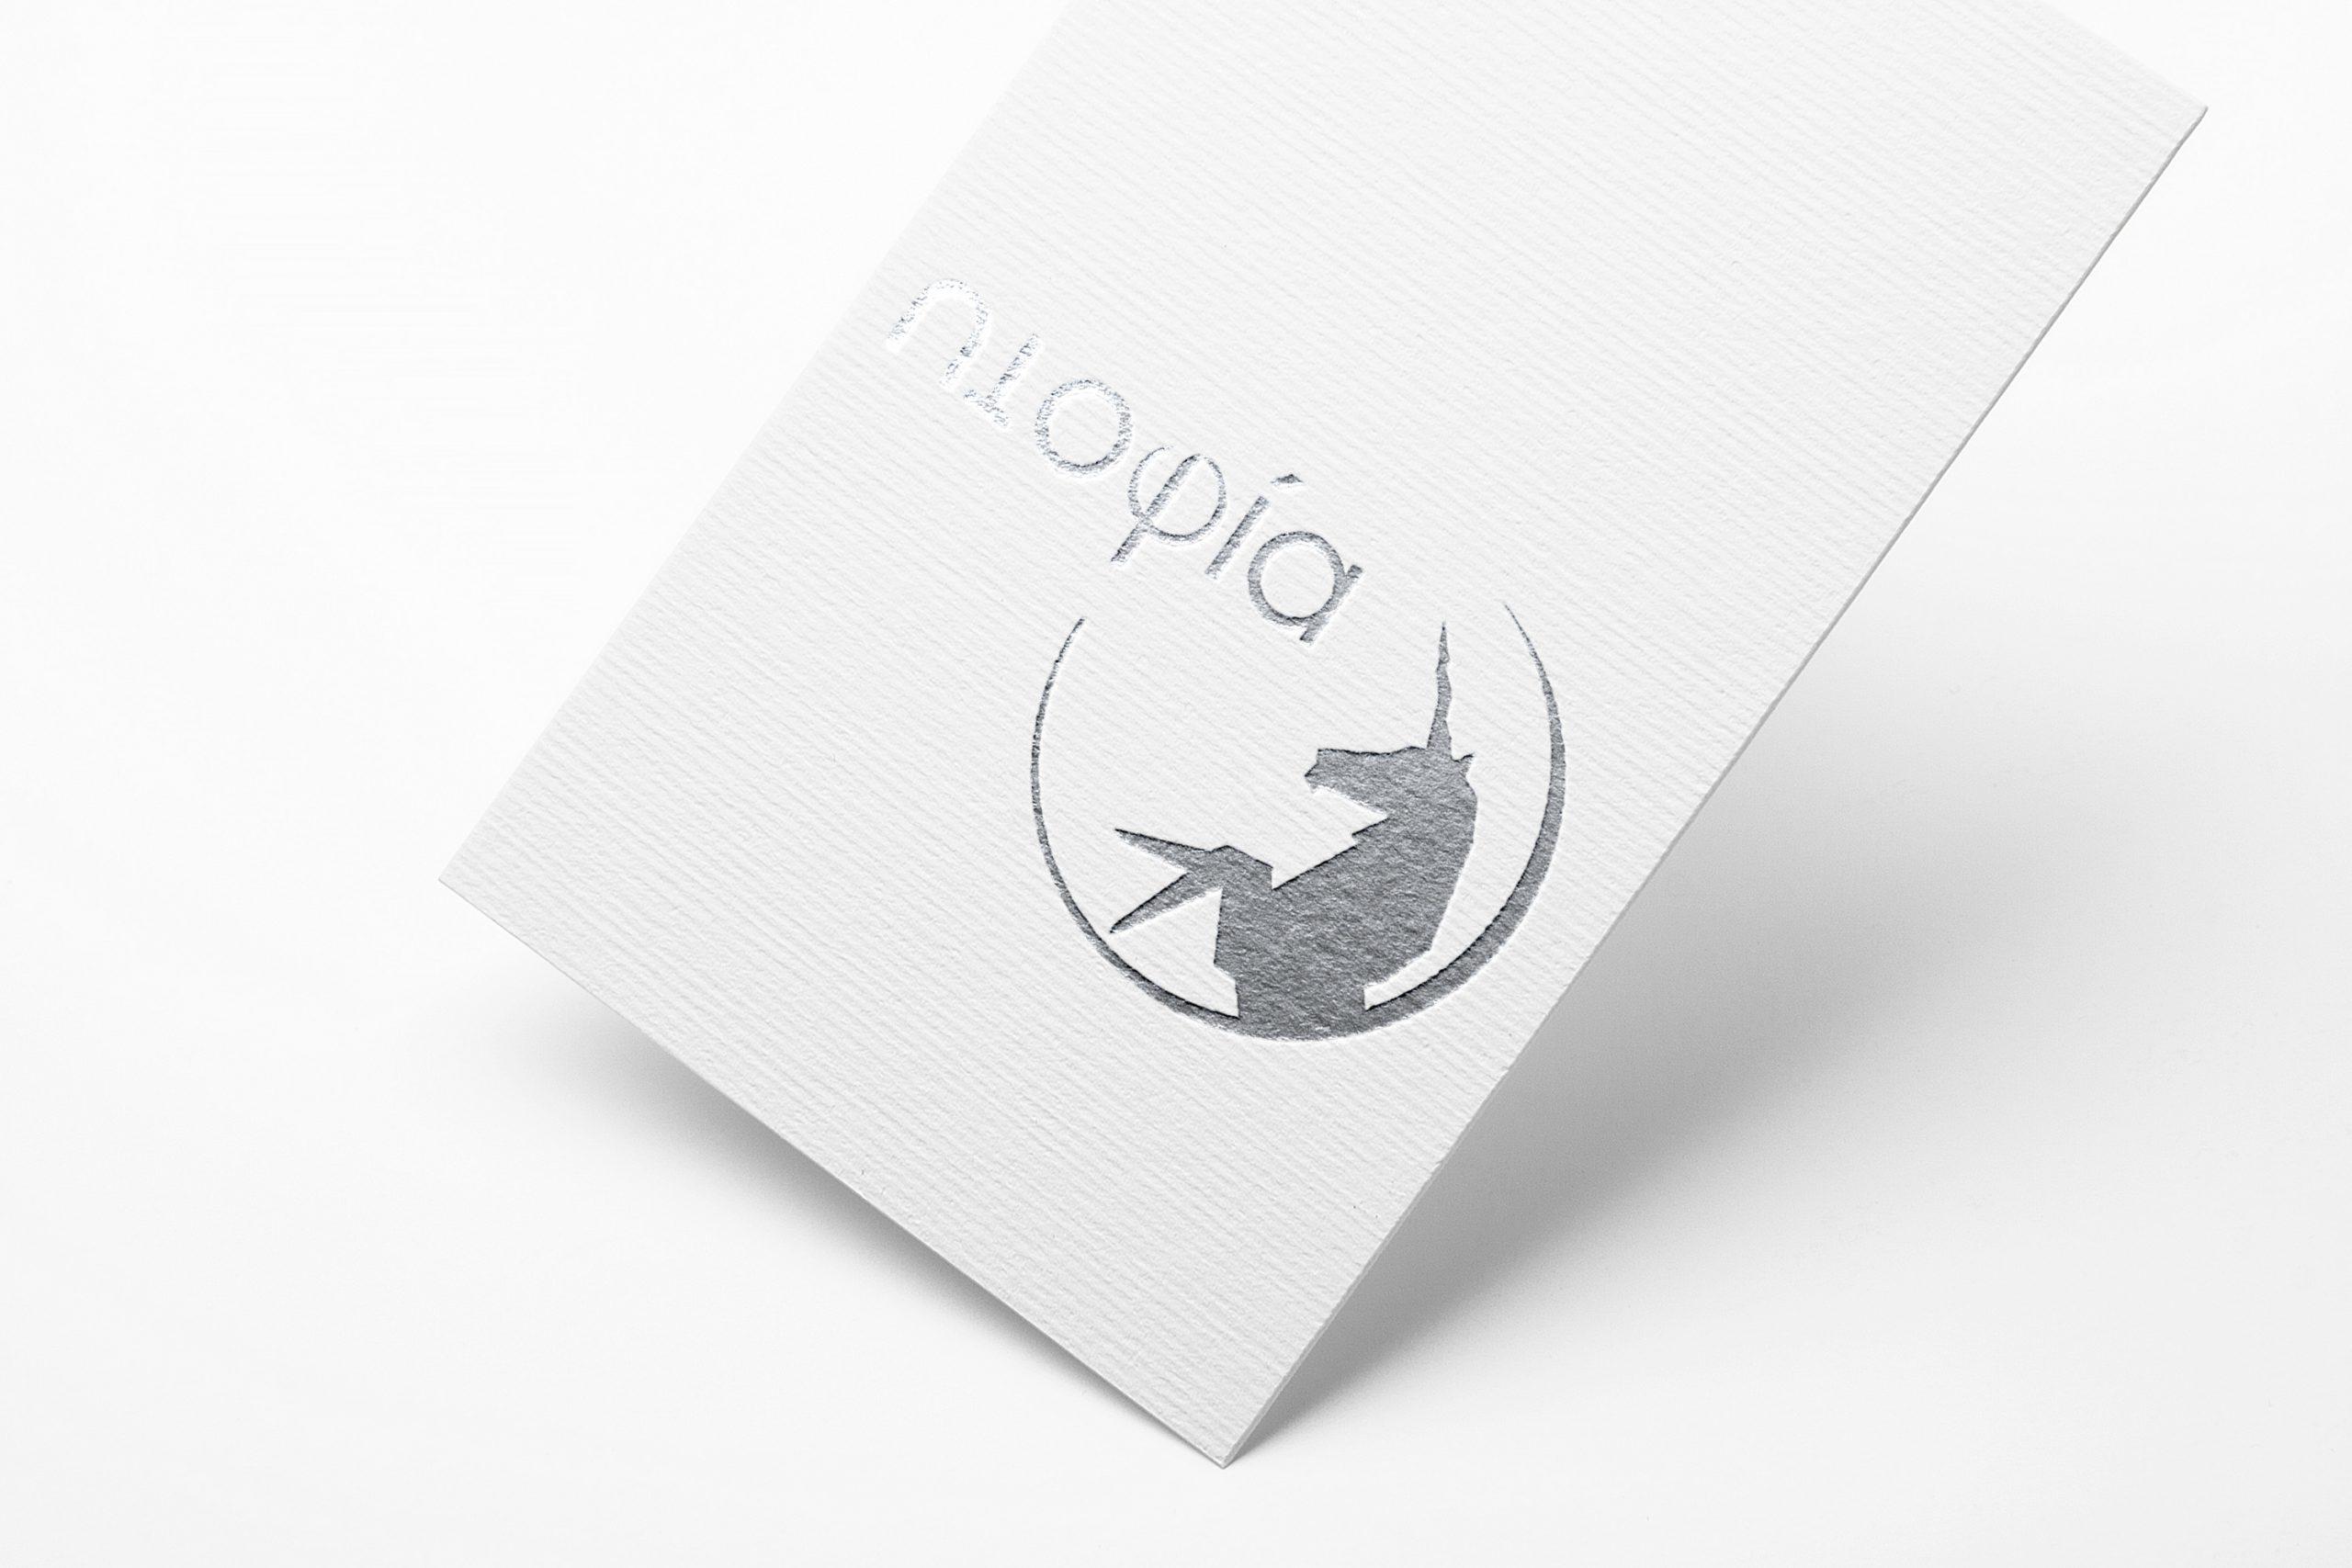 04_Utophia Ed logo design by Pau Vitti